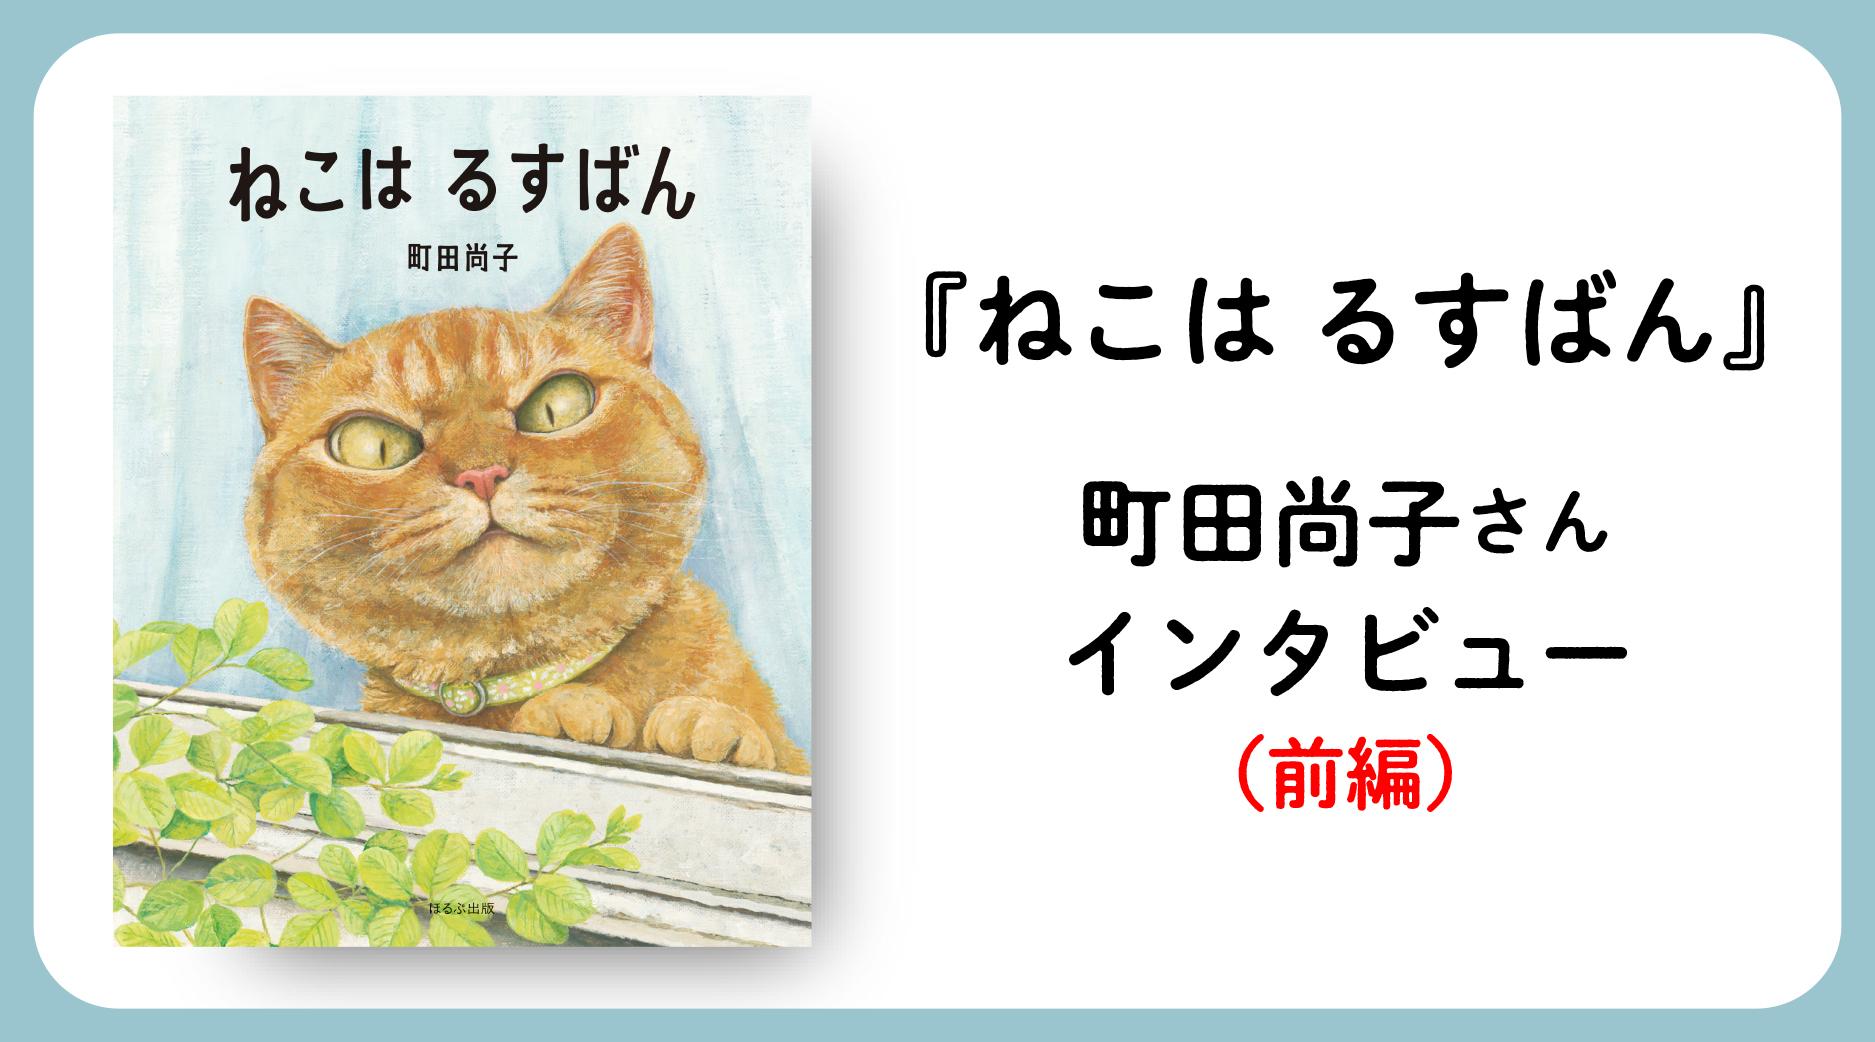 https://www.holp-pub.co.jp/news/n36825.html